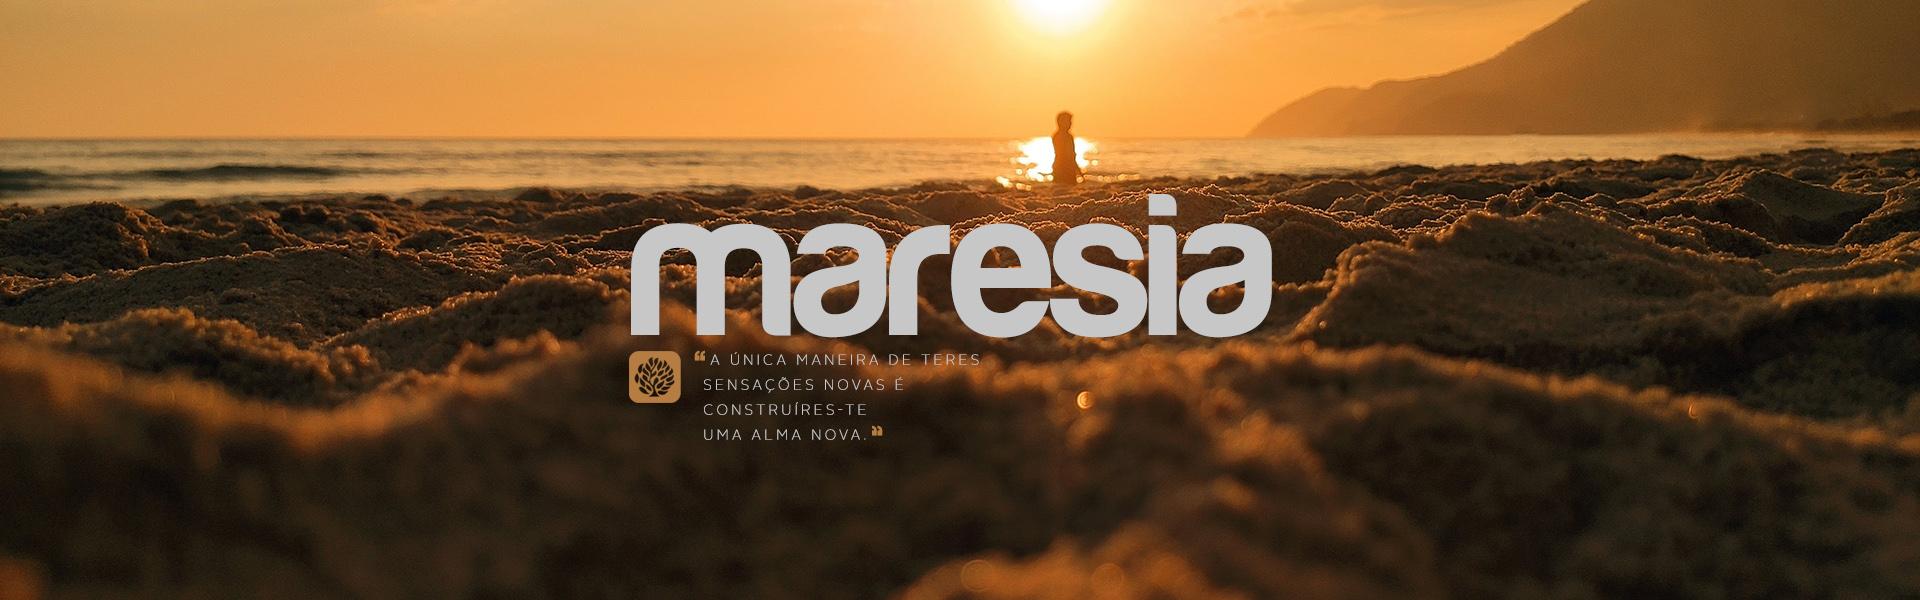 Maresia + WPP